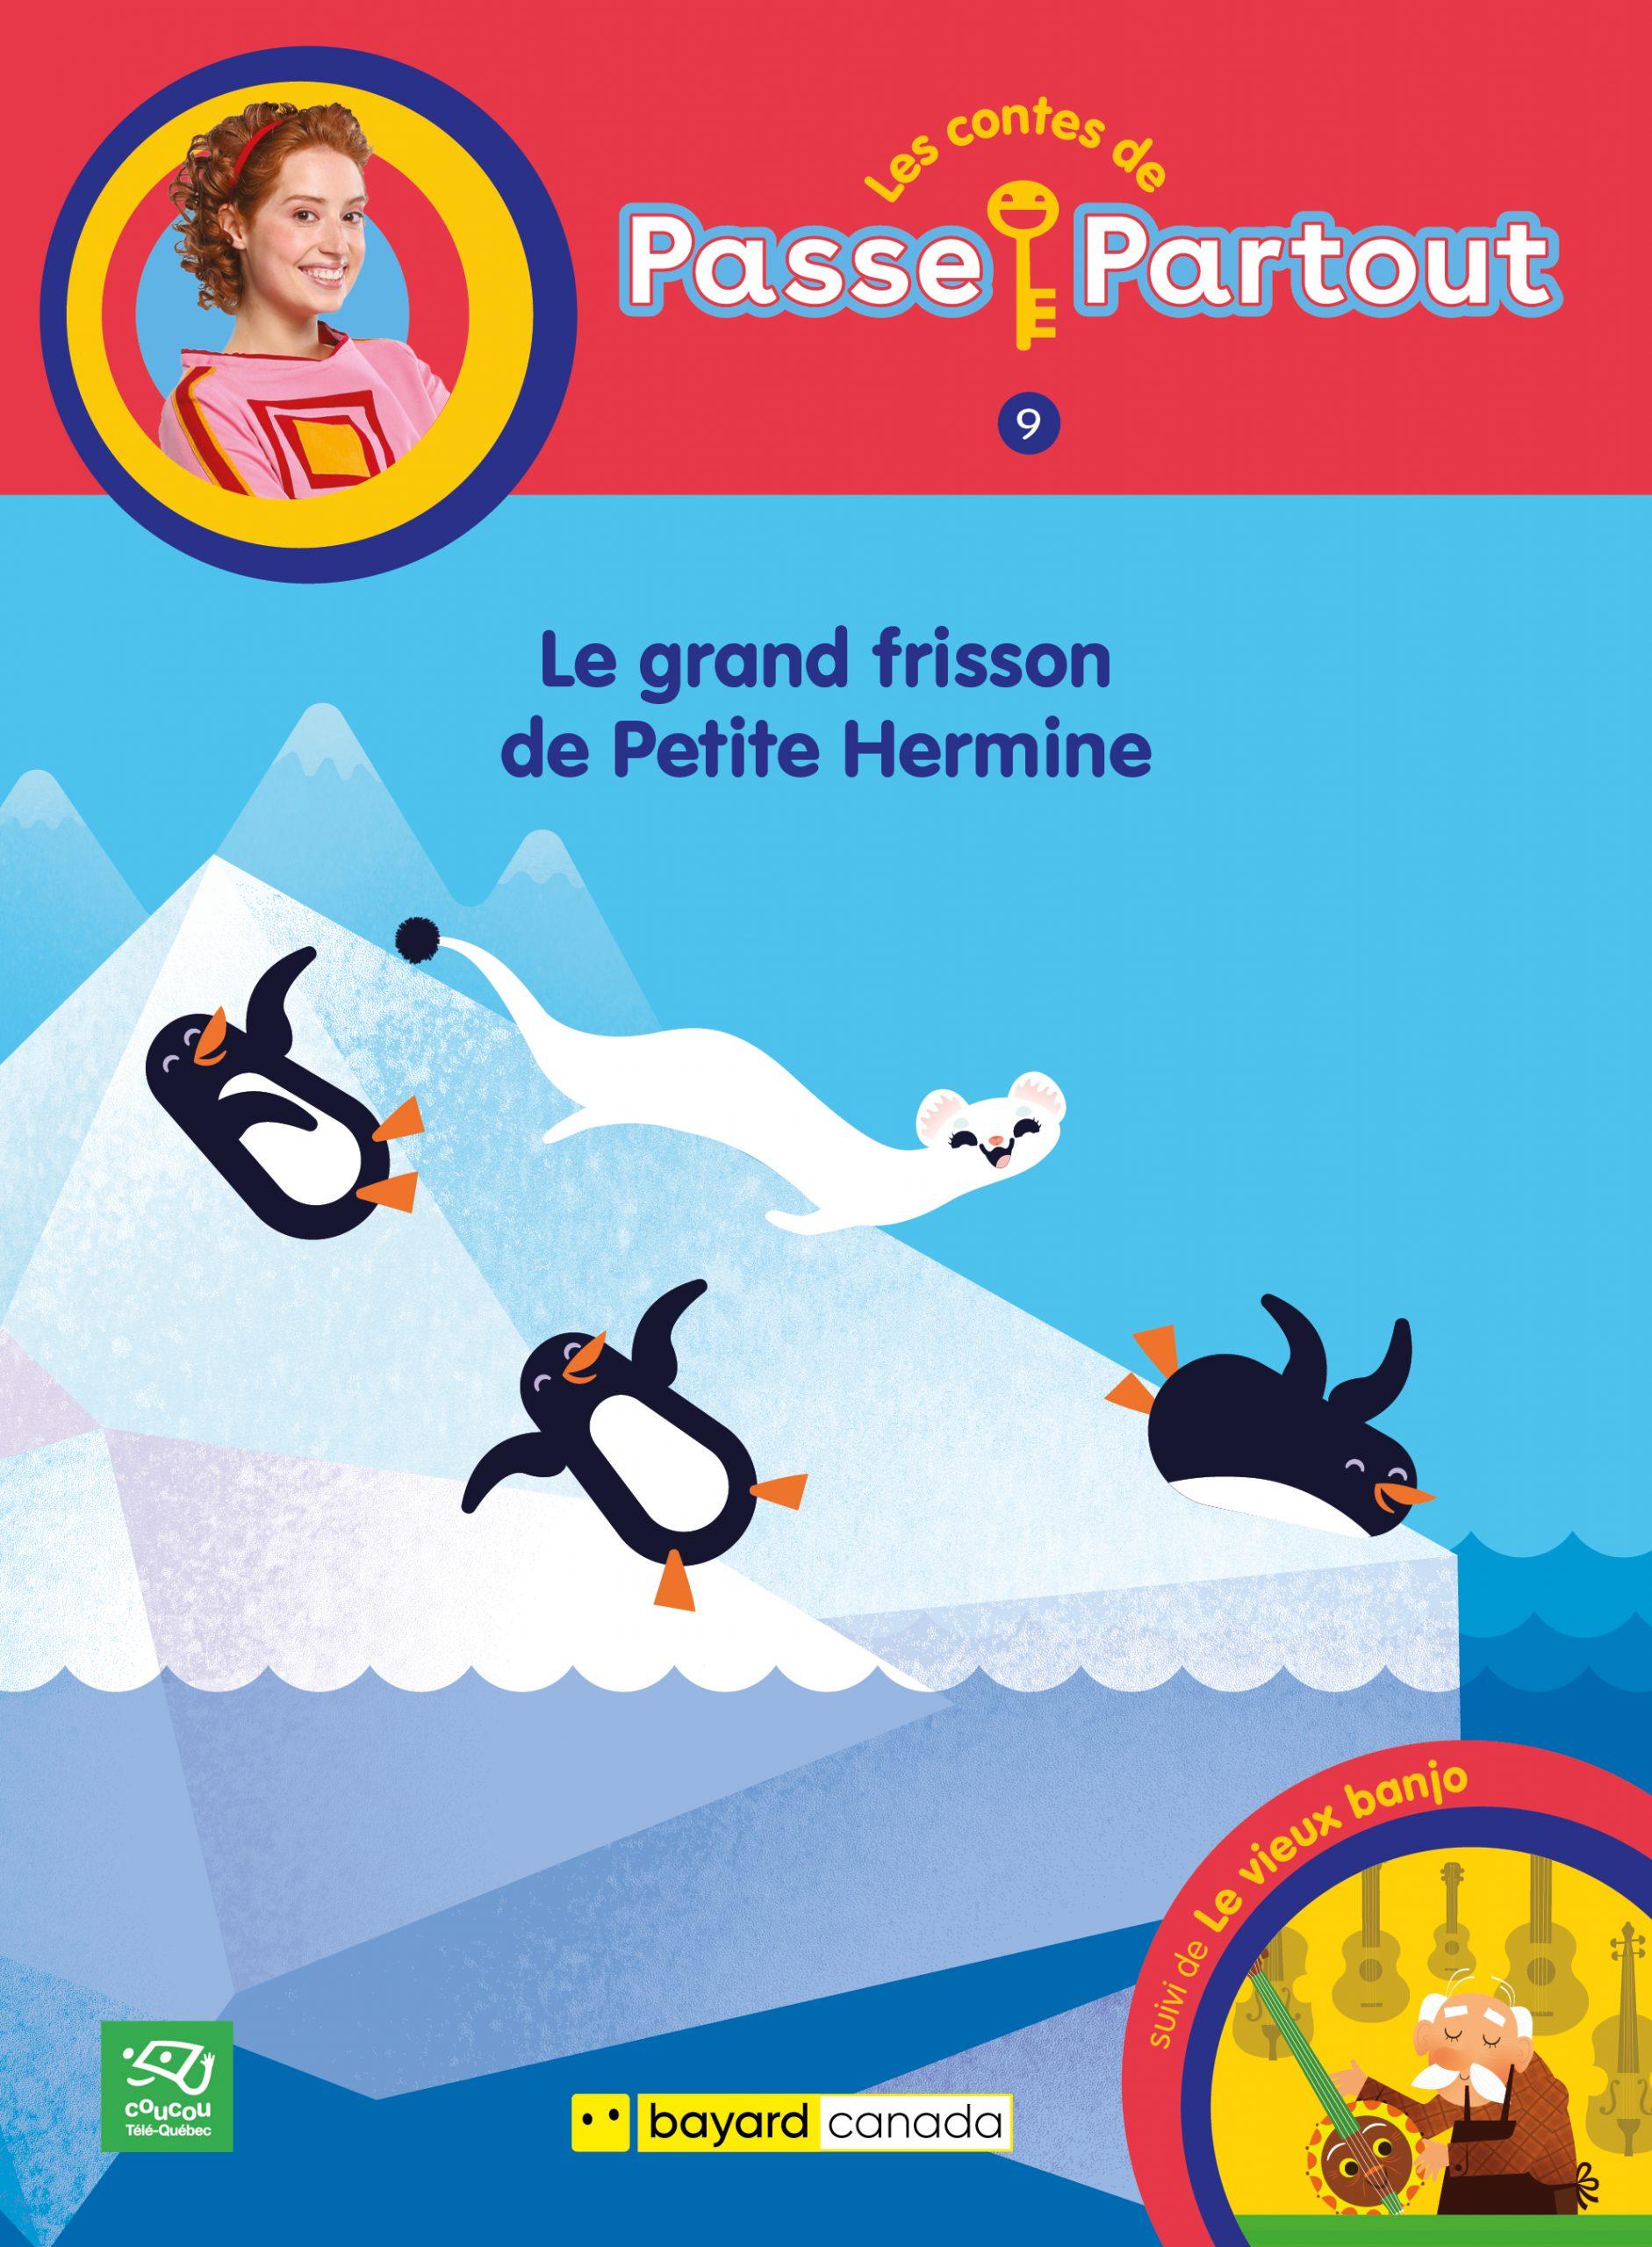 1. Le grand frisson de Petite Hermine